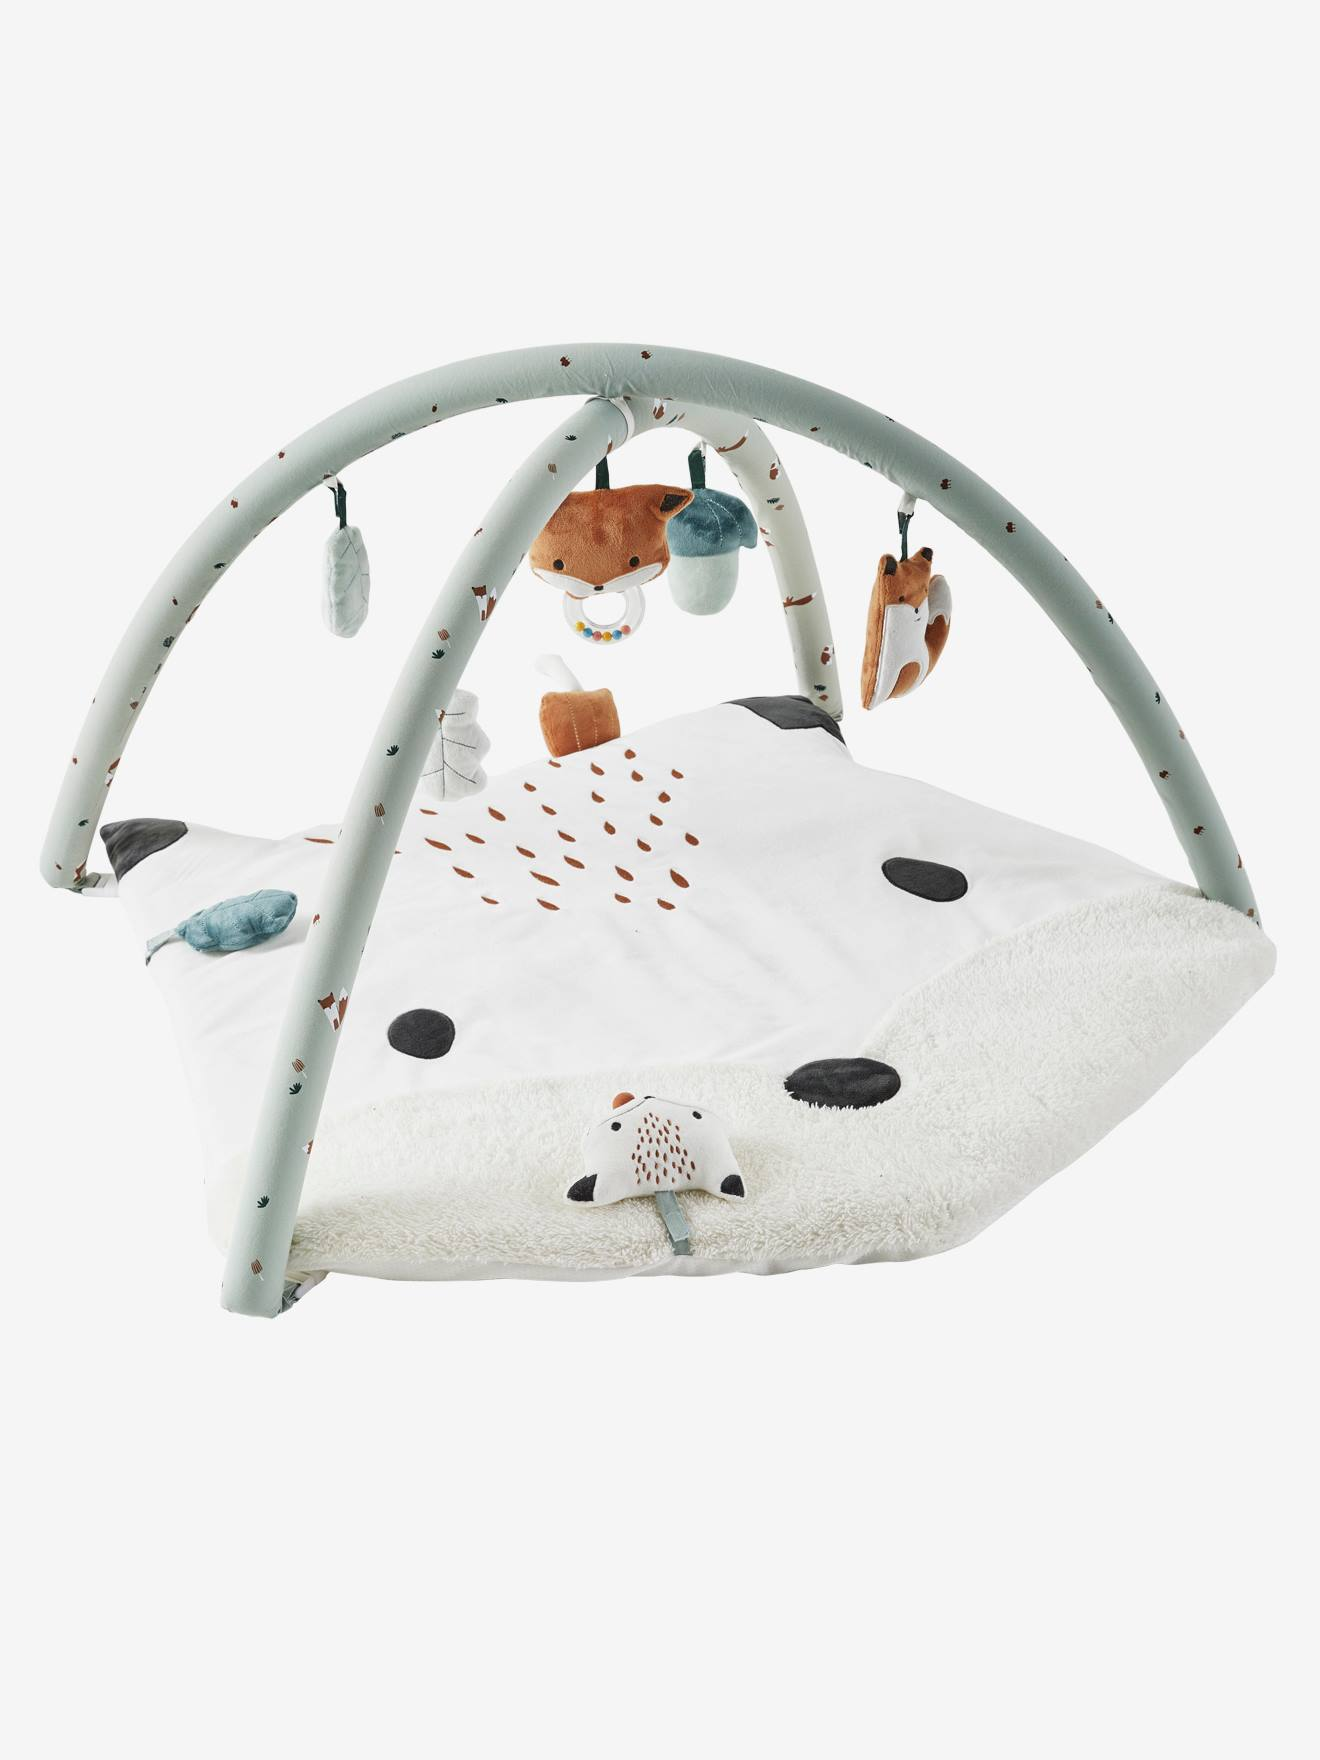 tapis d eveil avec arche renard vert gris